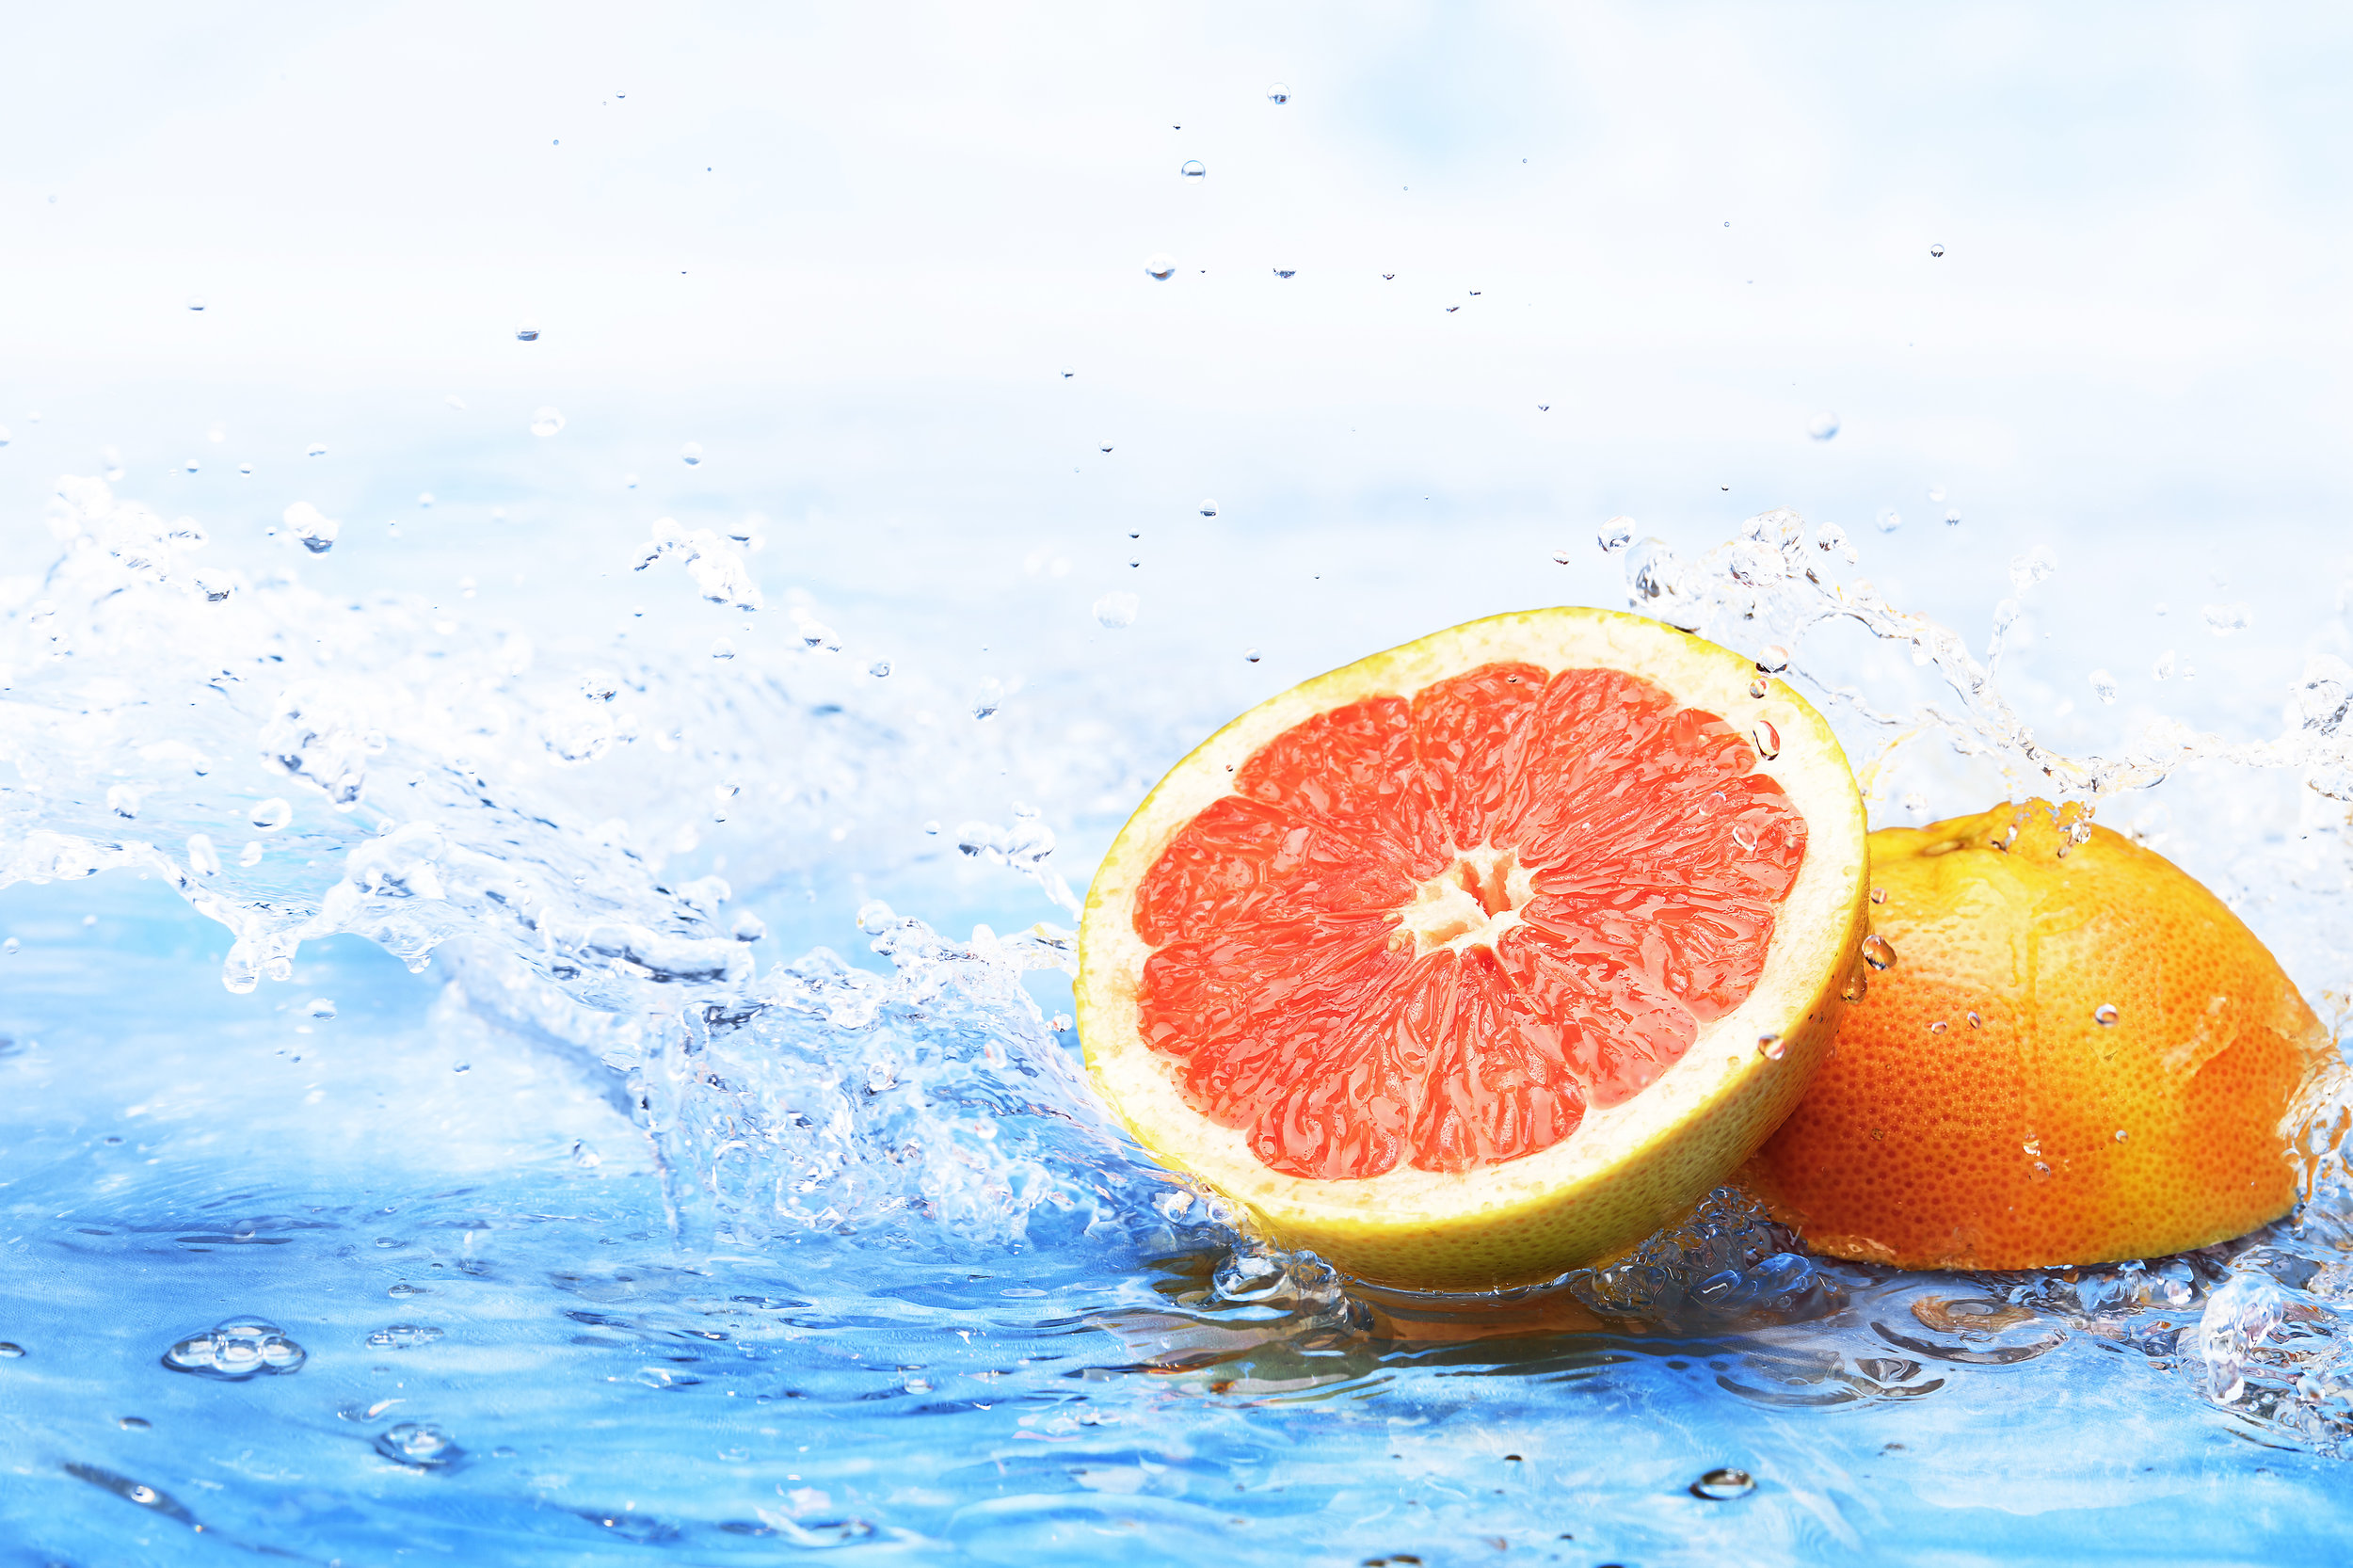 SparklingWaterGrapefruit_MSTR_CJI_WEB.jpg